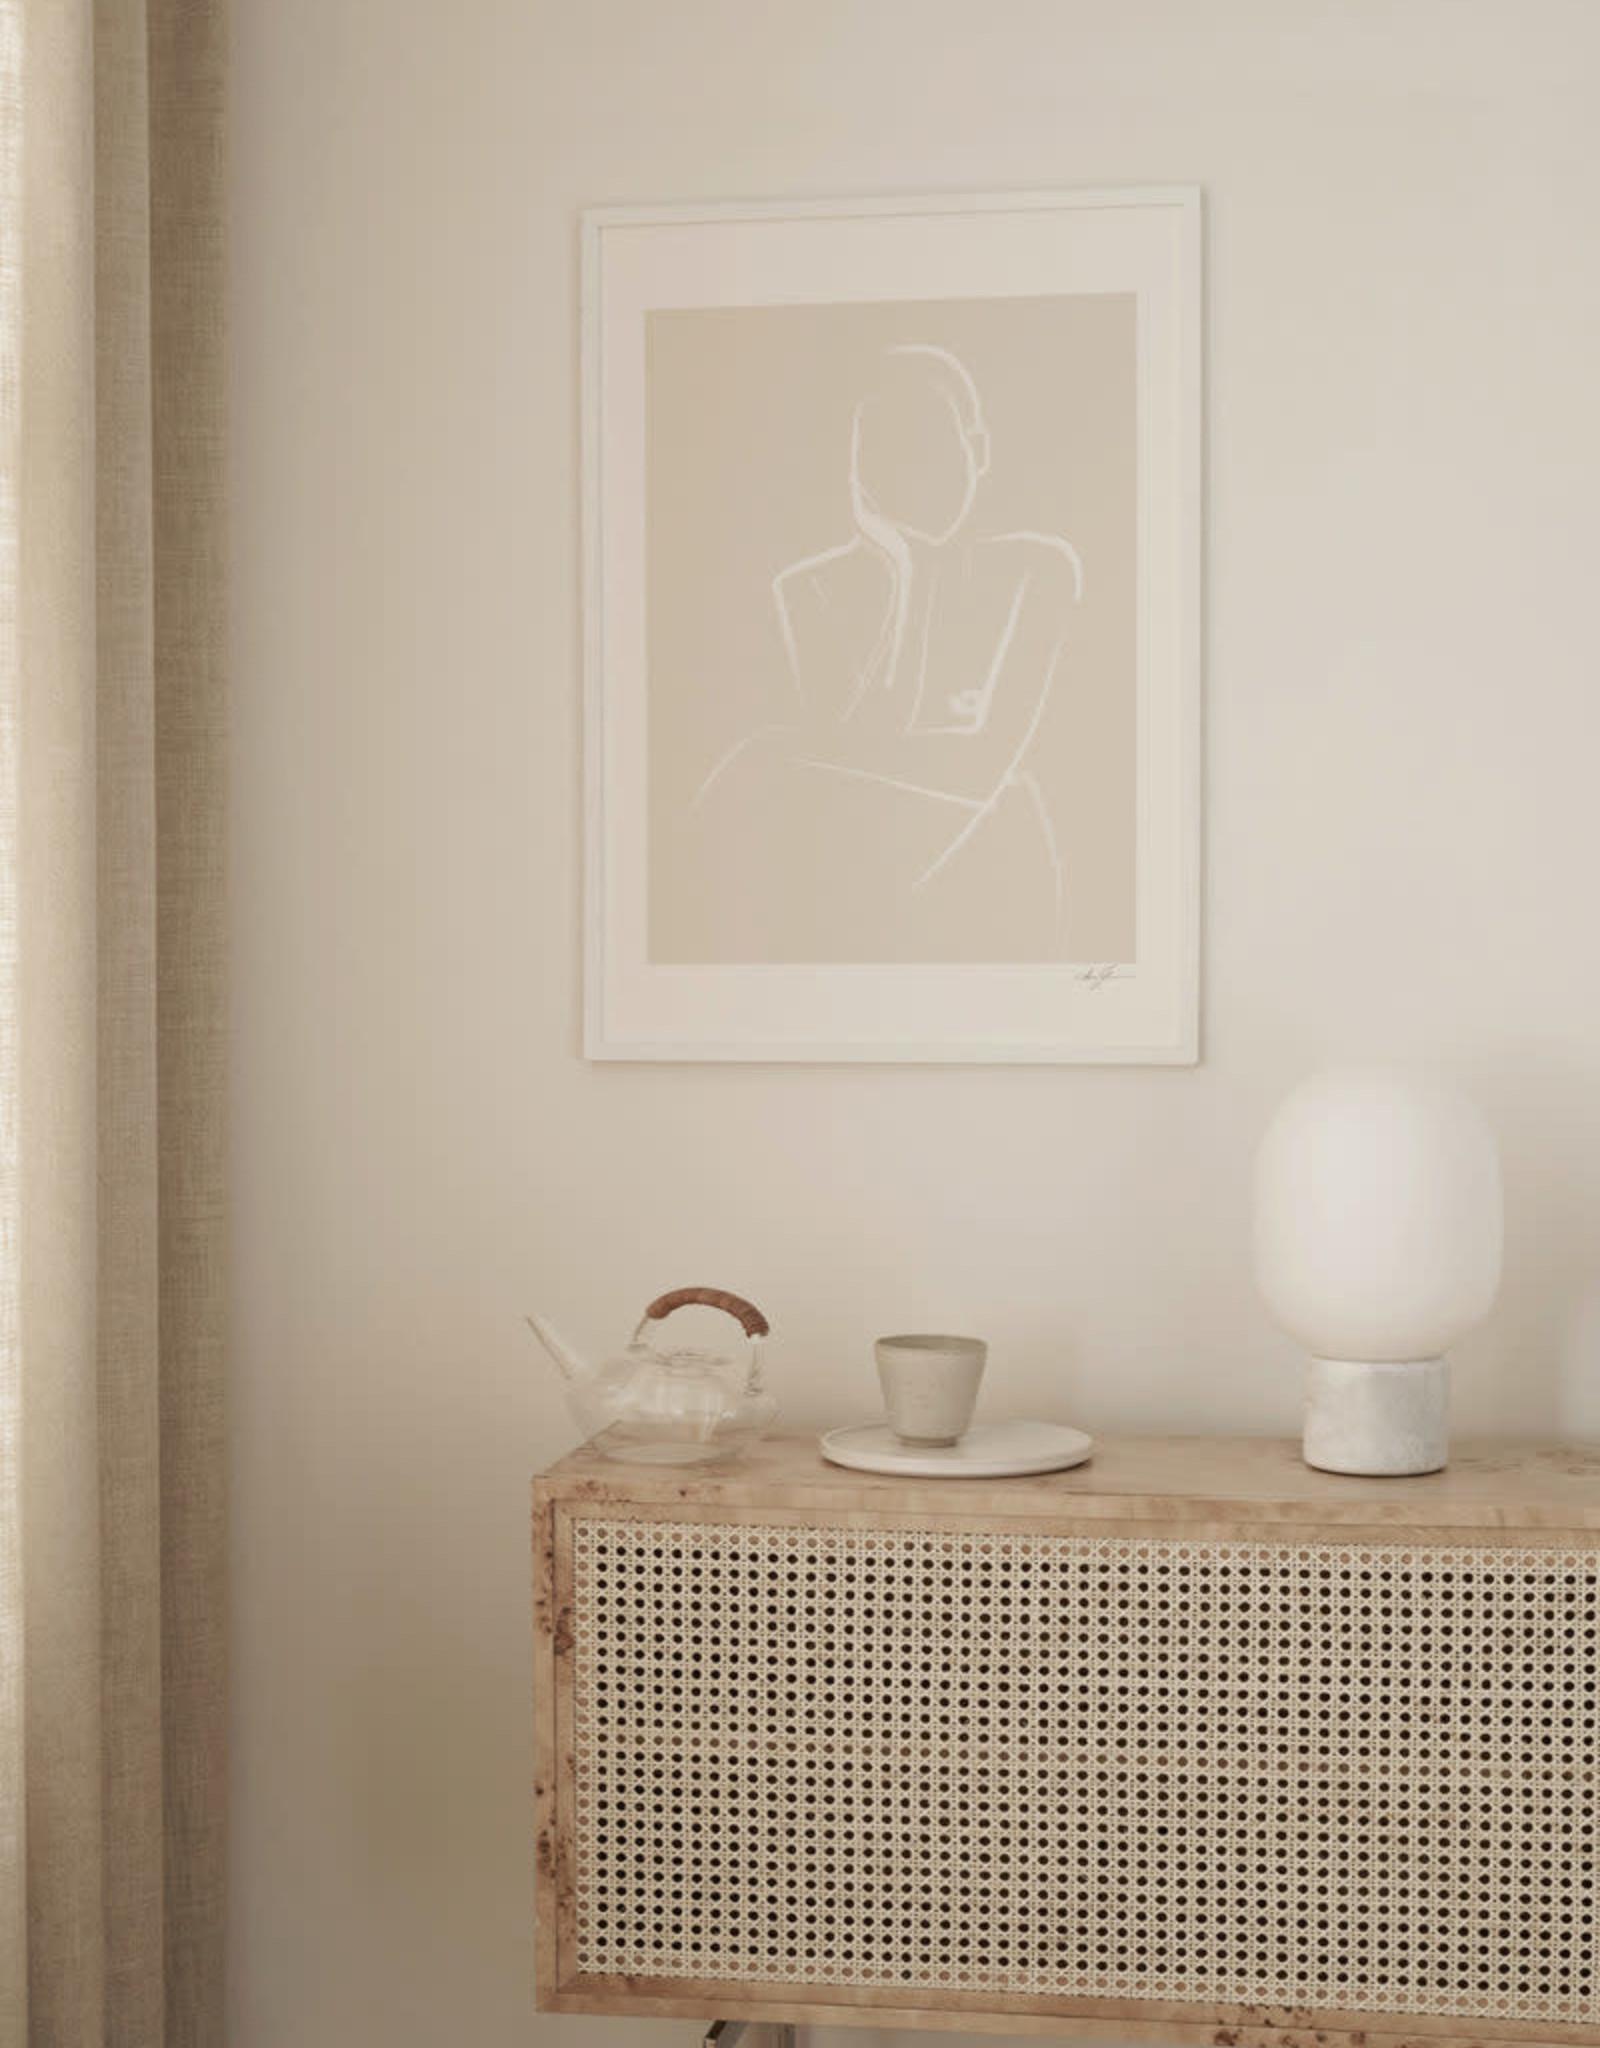 The Poster Club Affiche Demure - by Anna Johansson - 30 x 40 cm